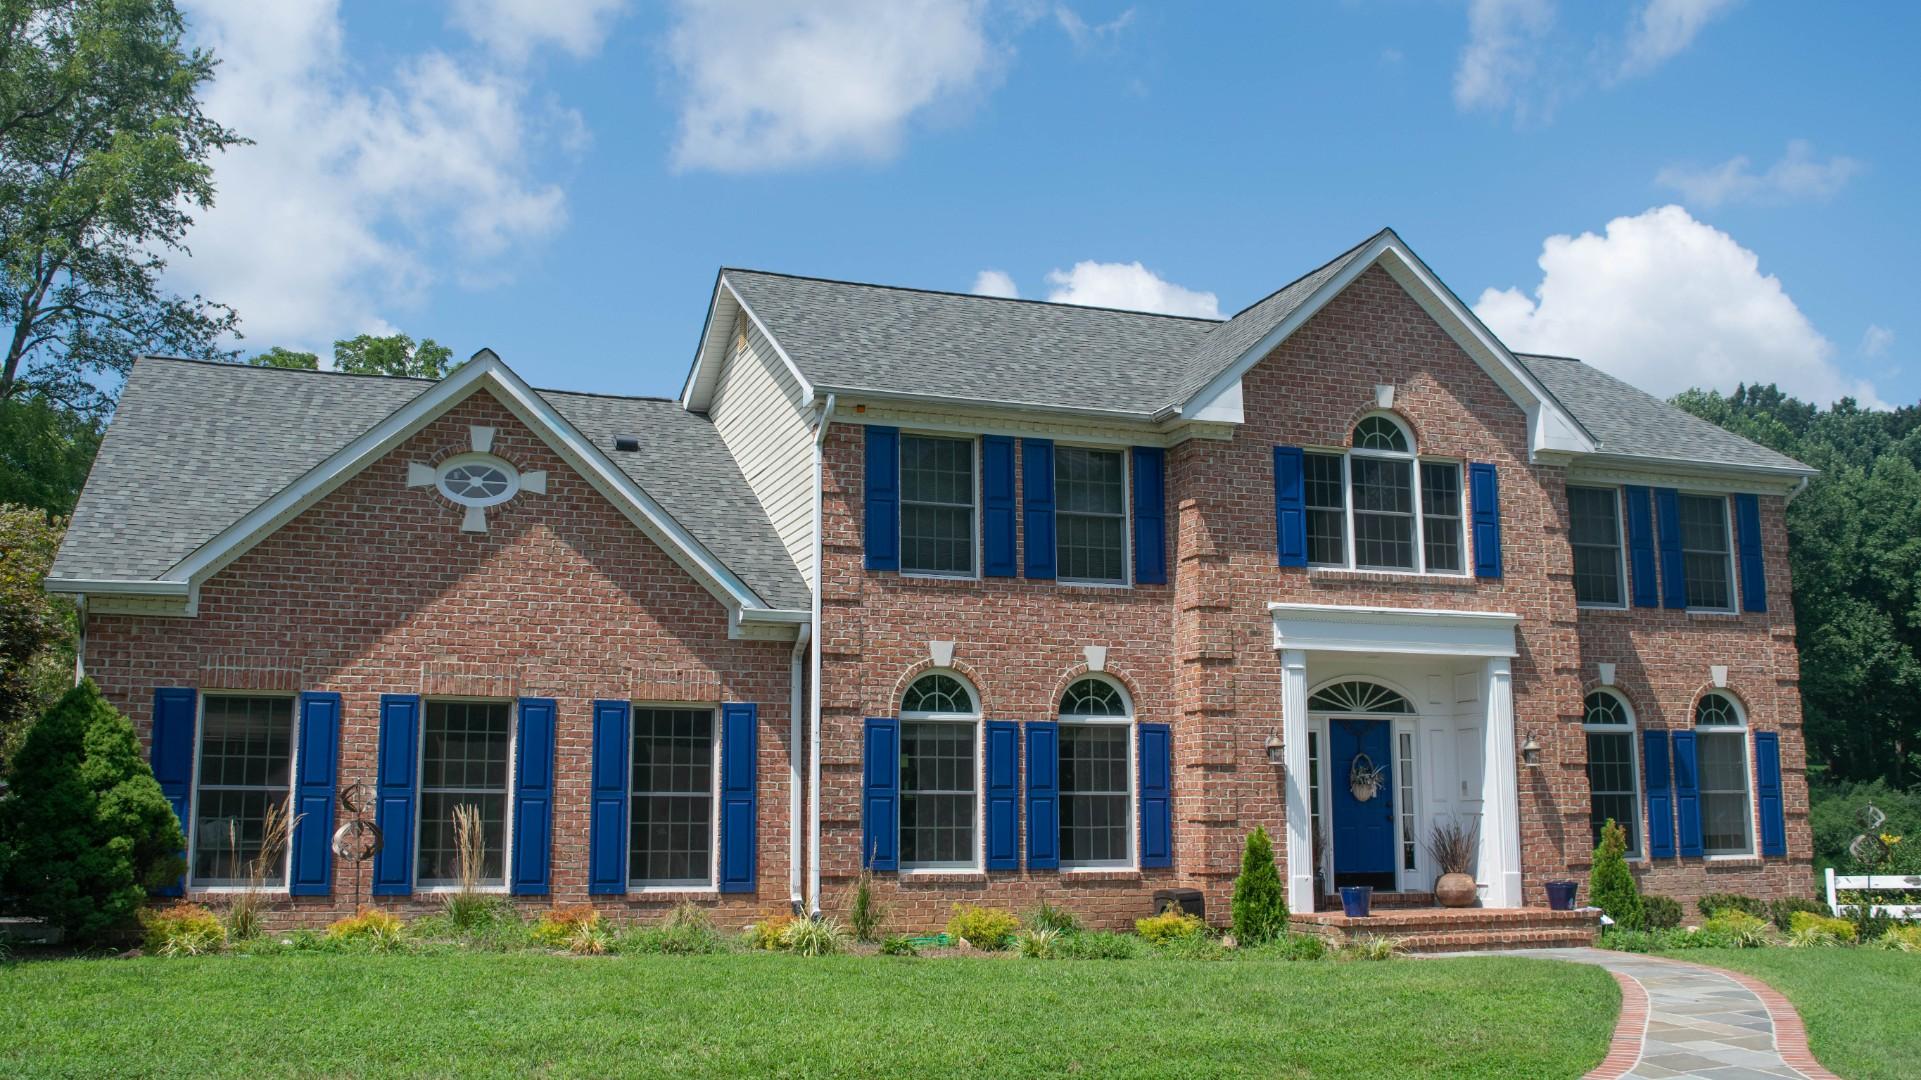 SmartRoof - Residential, Commercial Burlington NJ Roofing Contractors